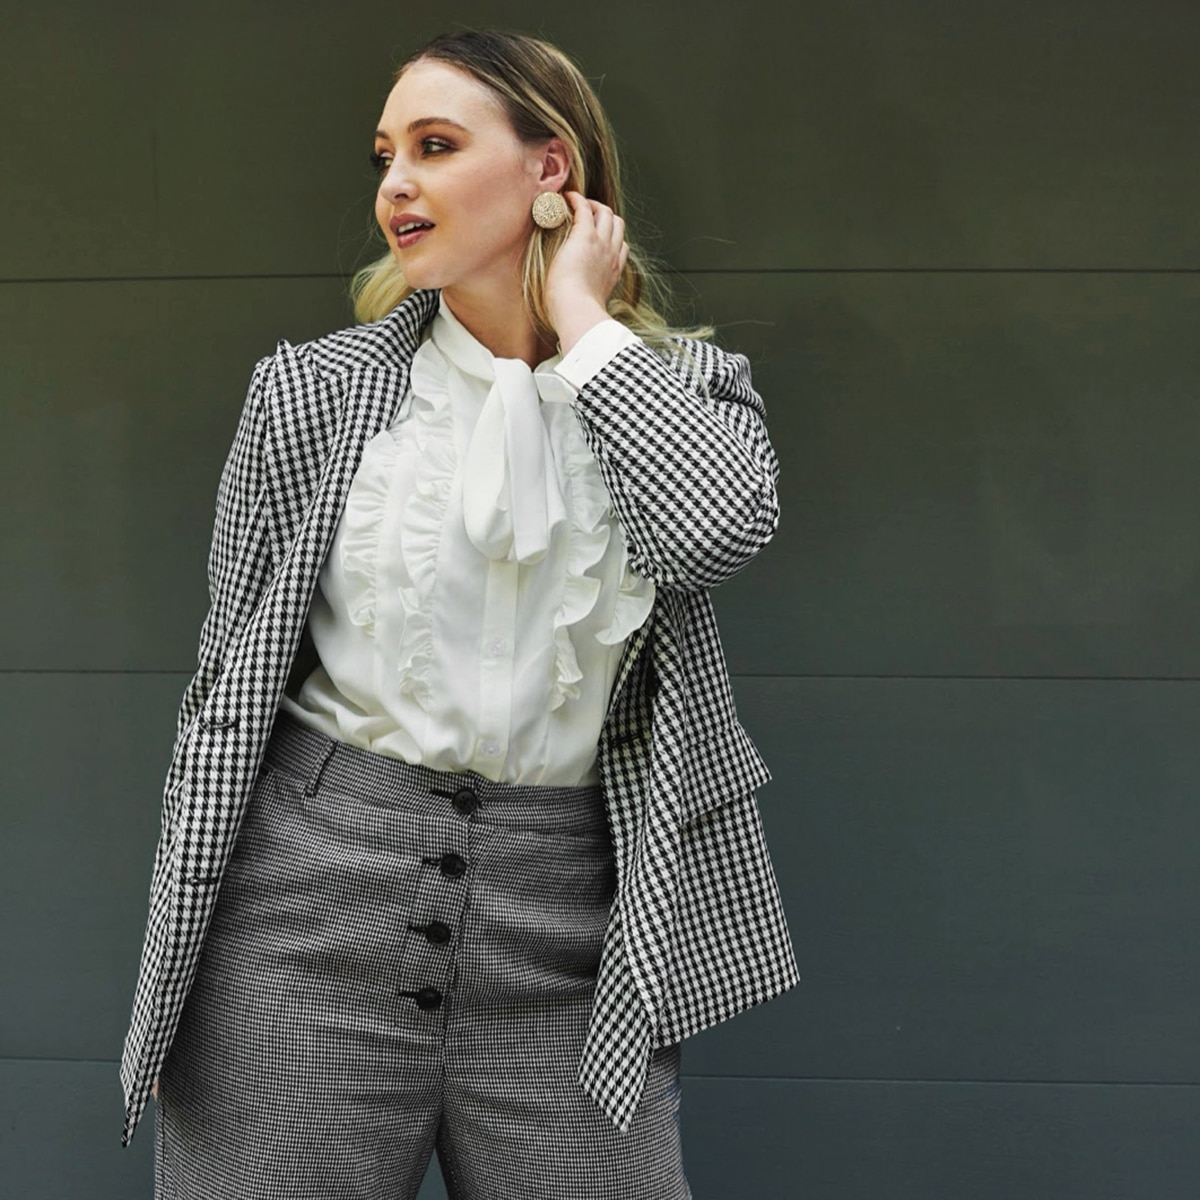 shein Zwart & wit Casual Houndstooth Grote maat: blazer Dubbele knoop